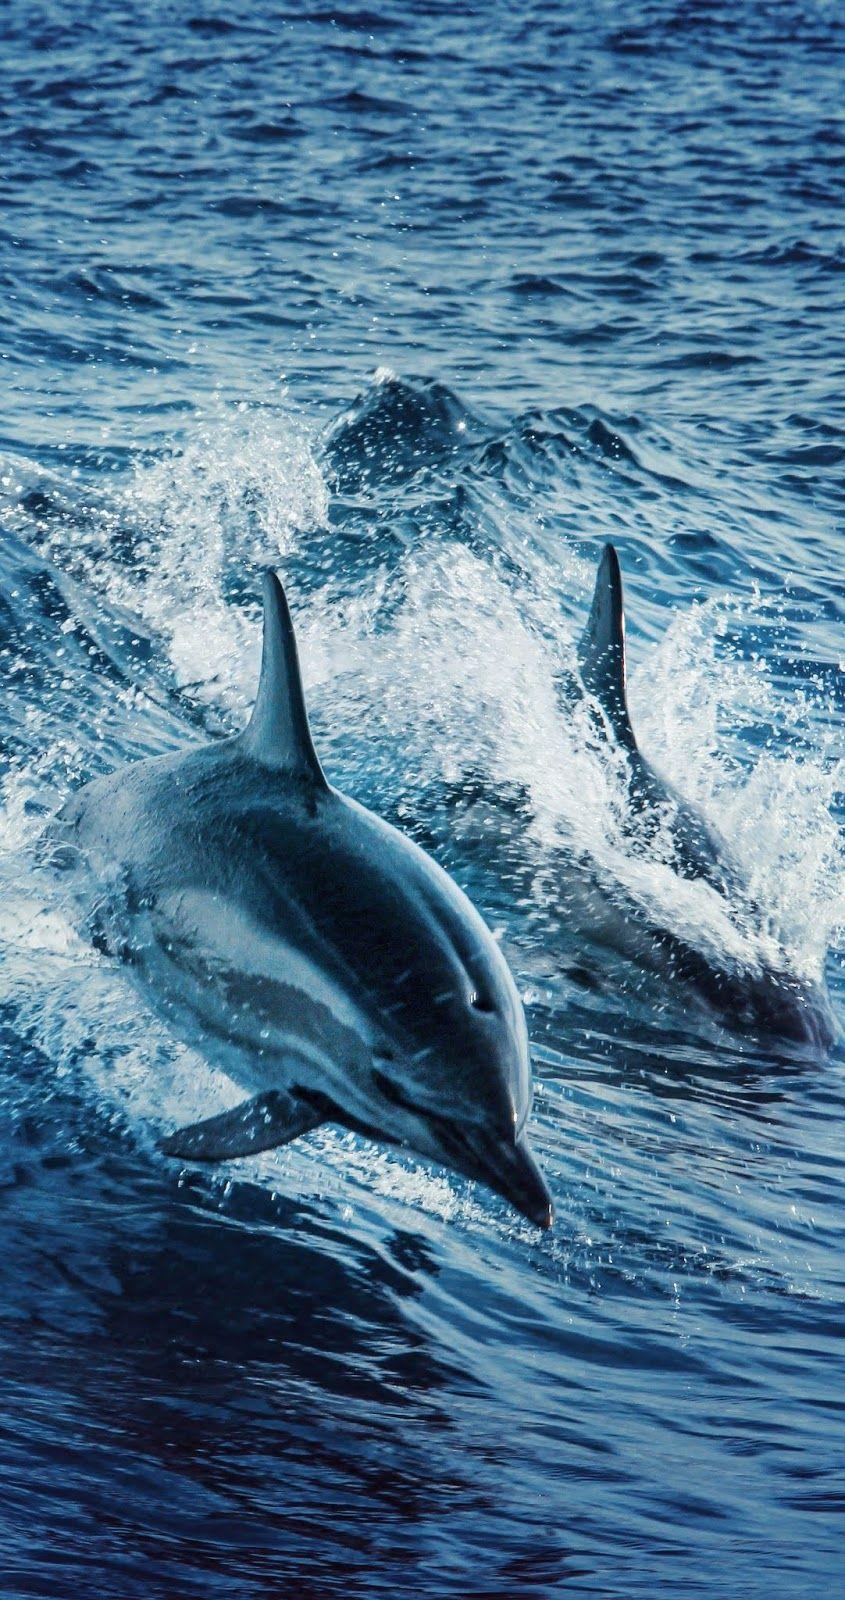 Amazing dolphins swimming. #Animals #AnimalsBeautiful #Dolphin #SeaAnimals